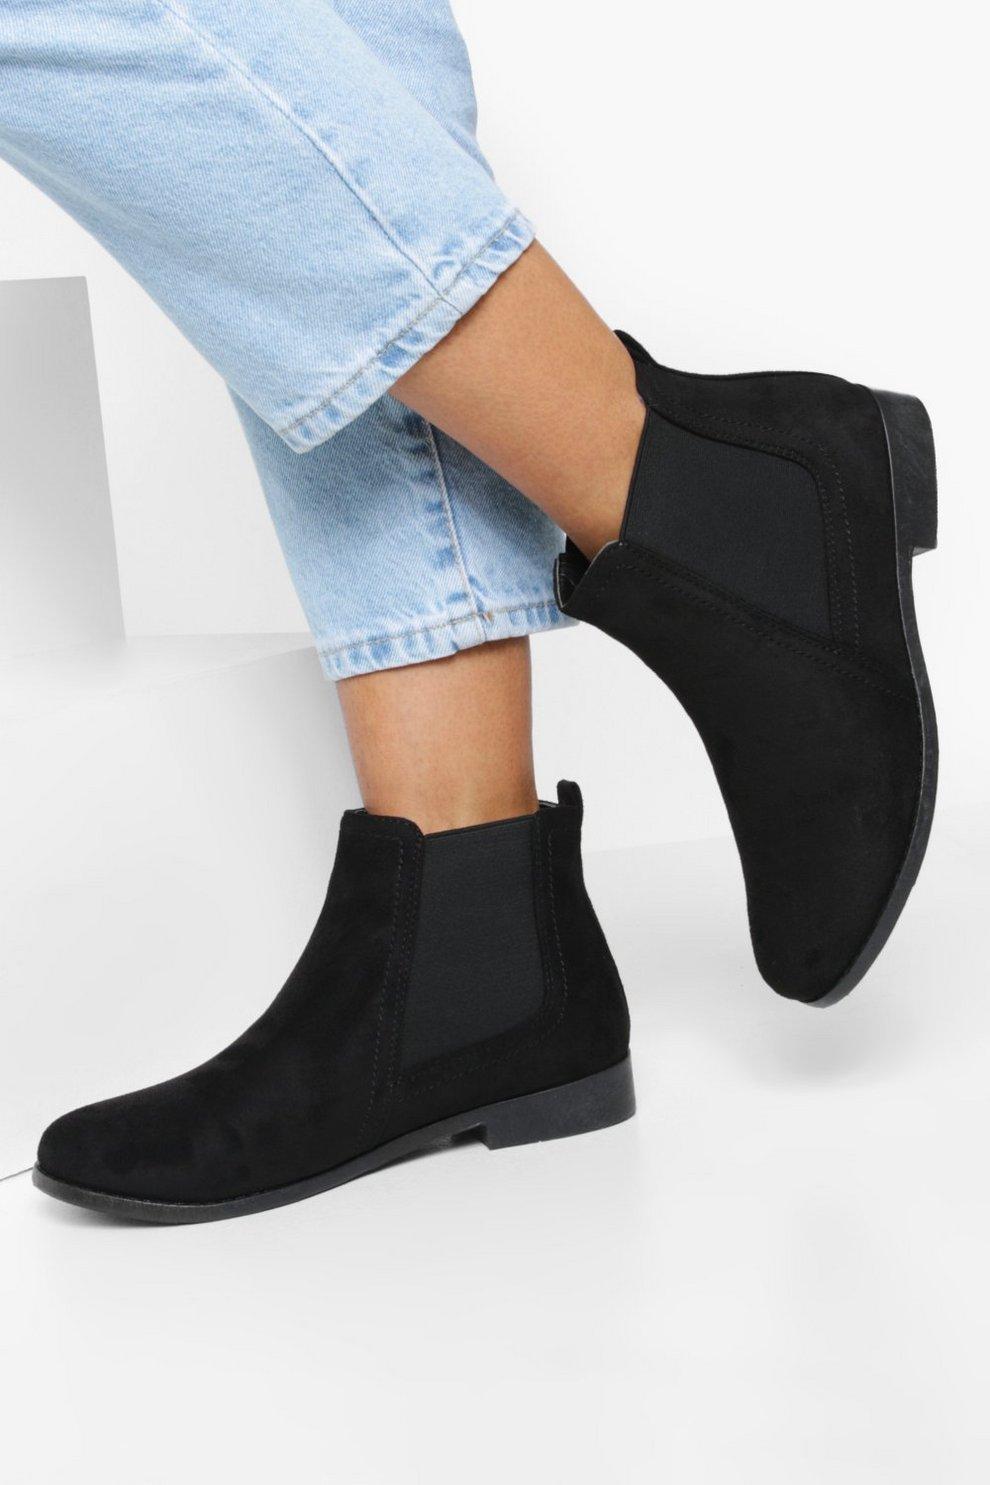 4e888925b456 Wide Fit Suedette Flat Chelsea Boots